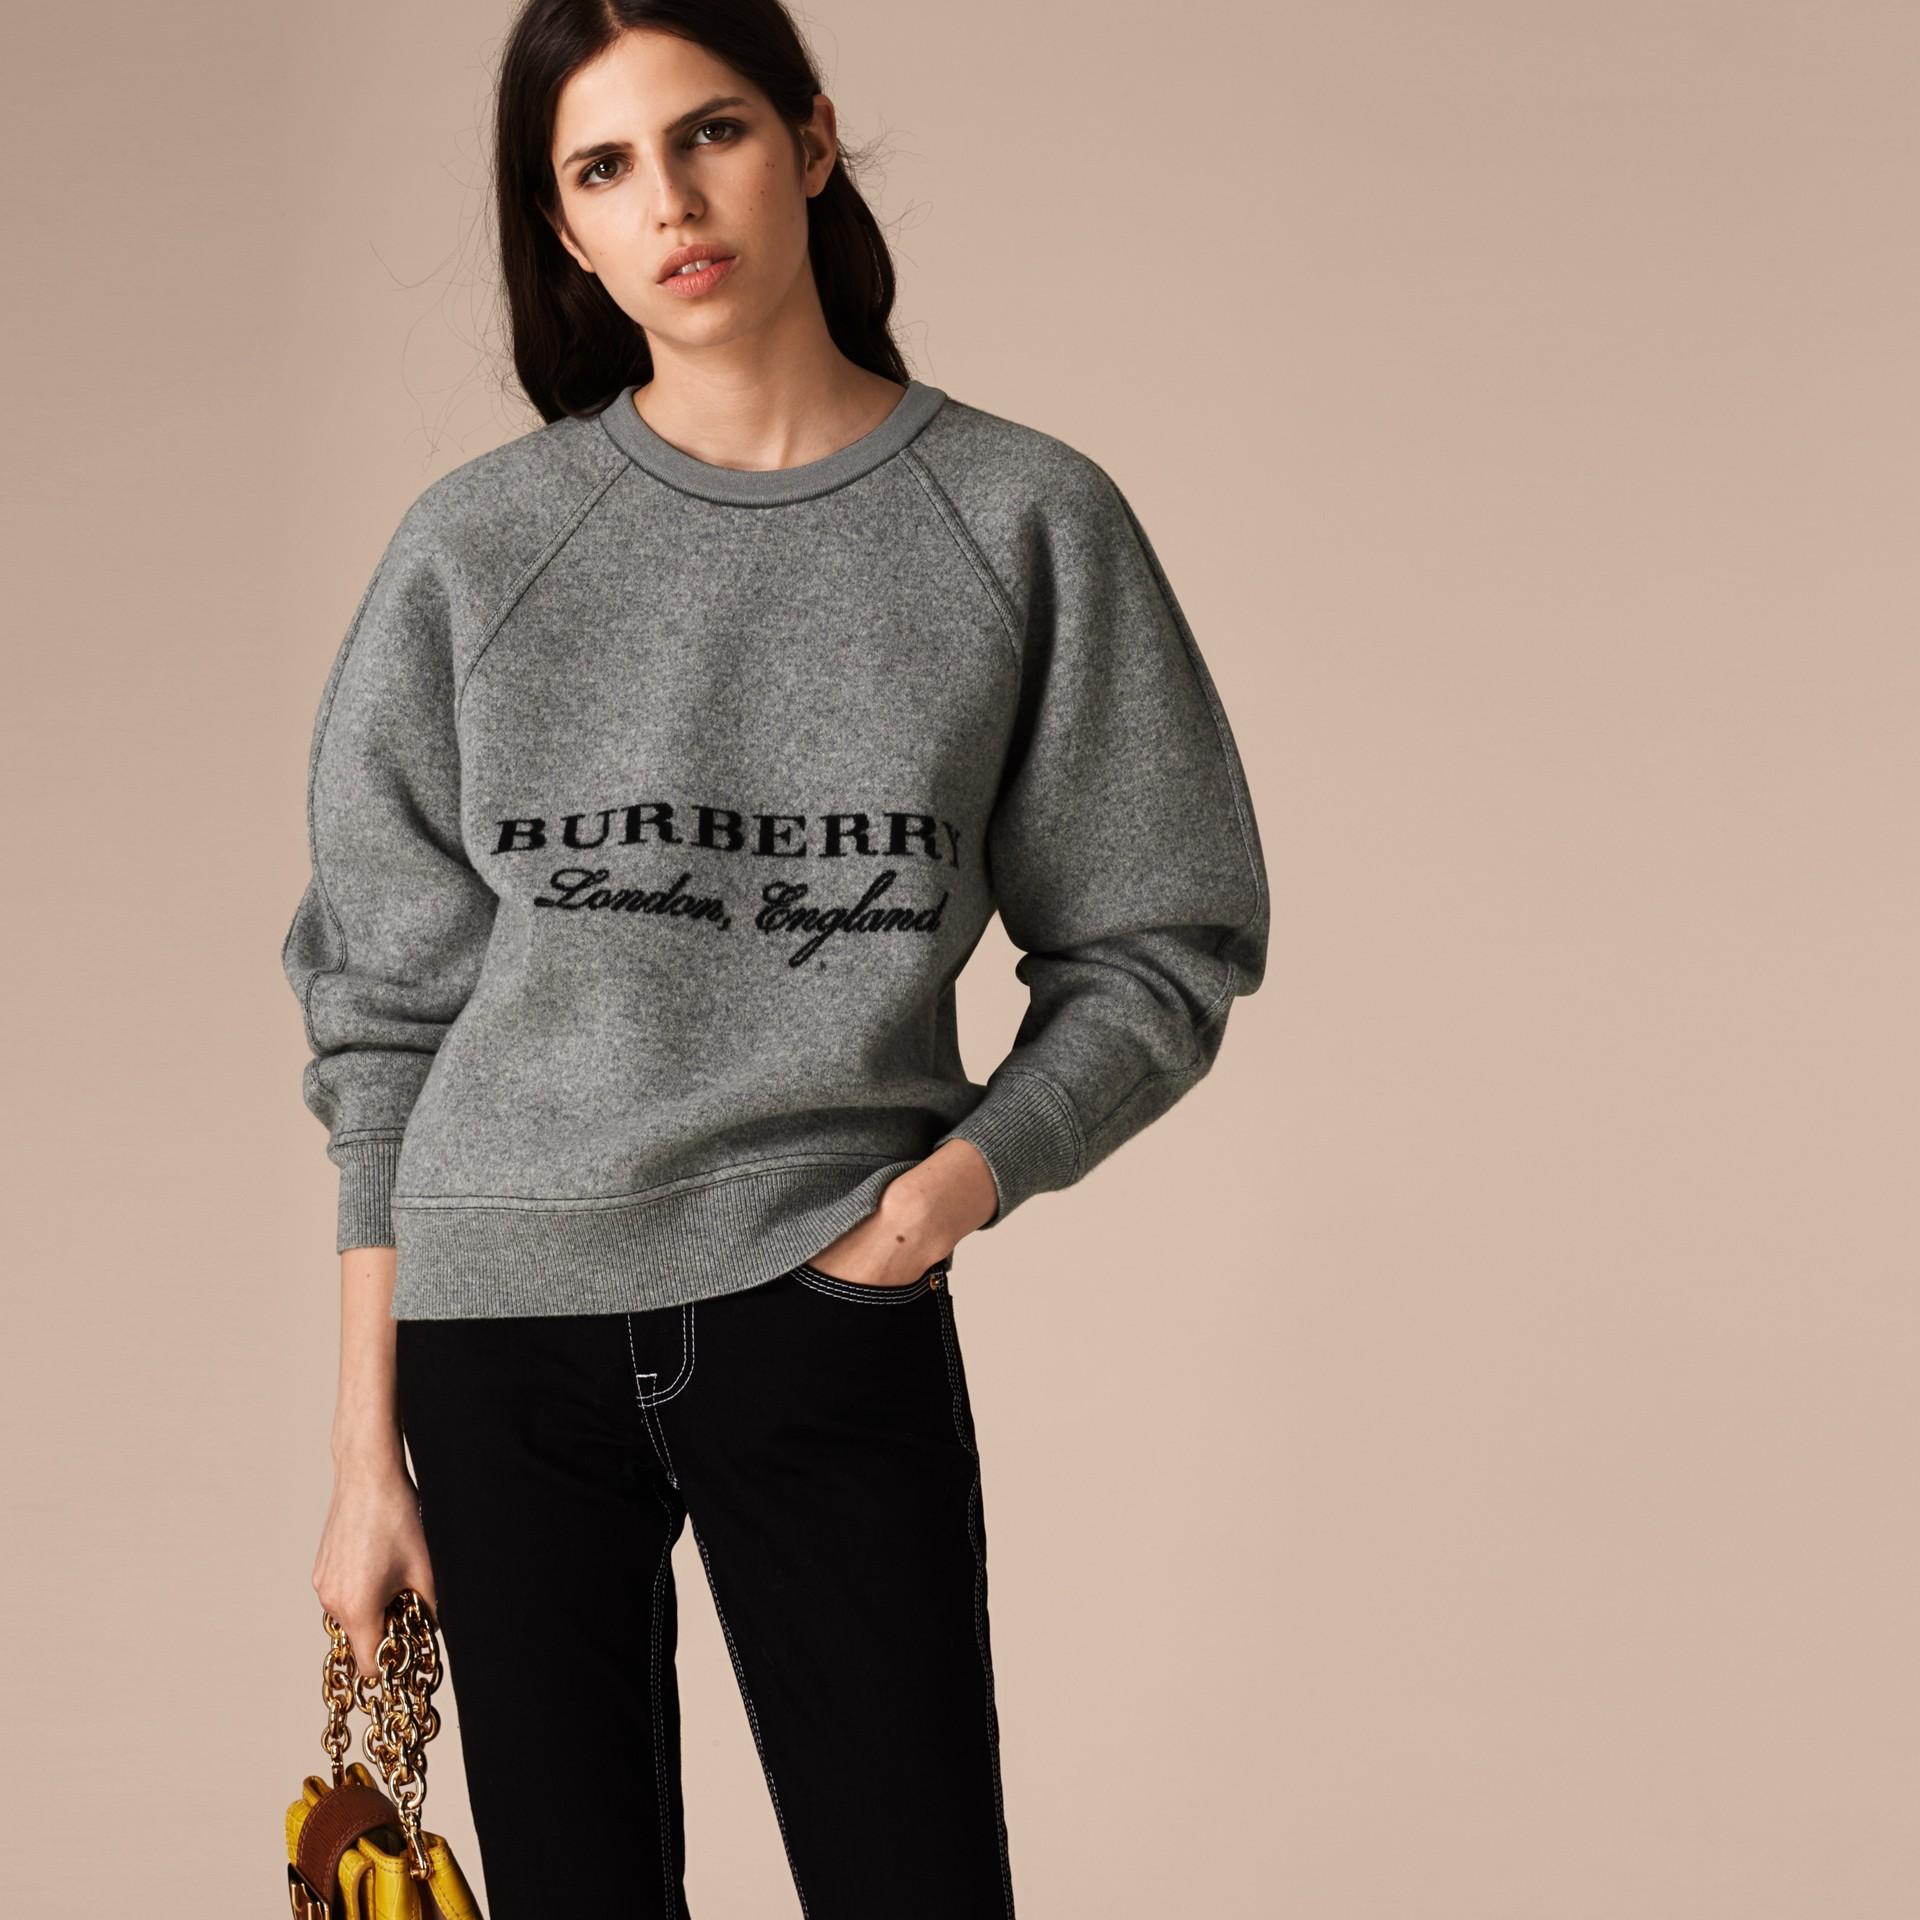 Grigio medio mélange/nero Pullover strutturato in lana e cashmere Grigio Medio Mélange/nero - immagine della galleria 3